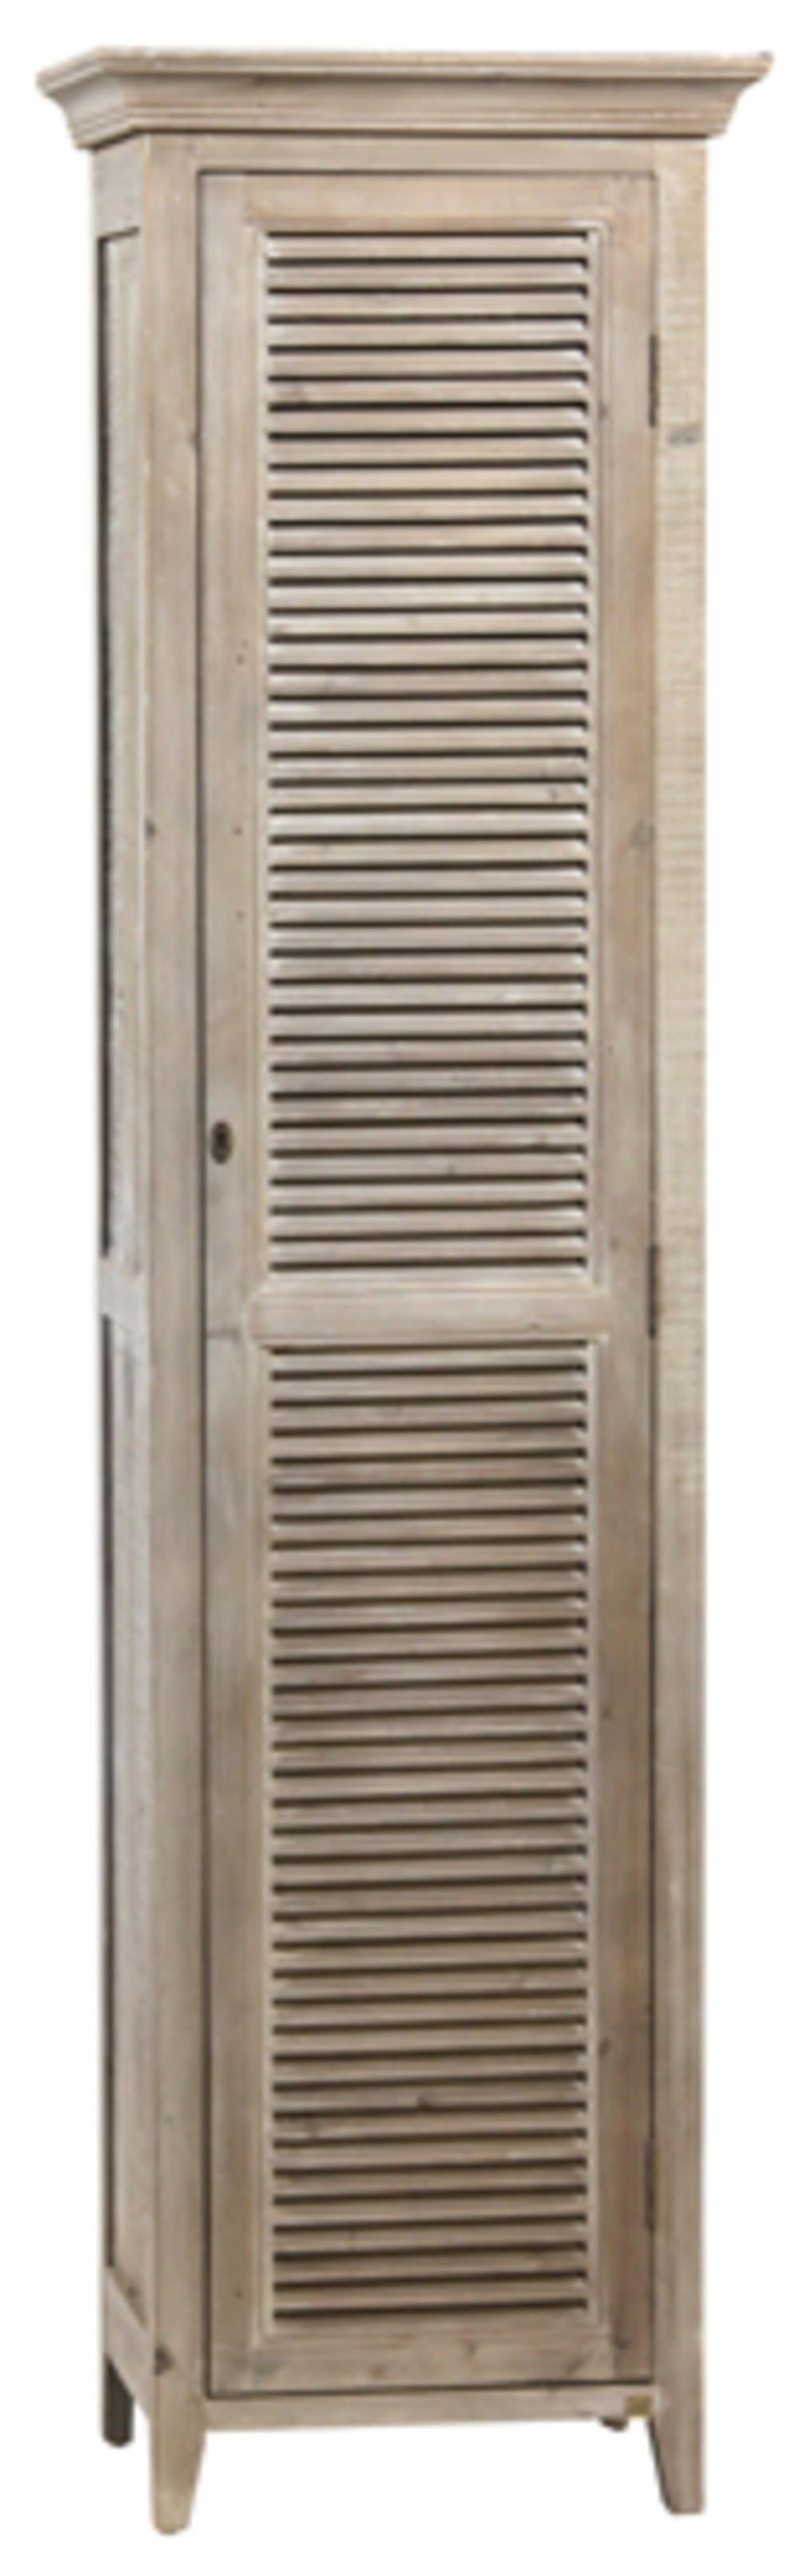 Dovetail Furniture - Valentin Cabinet